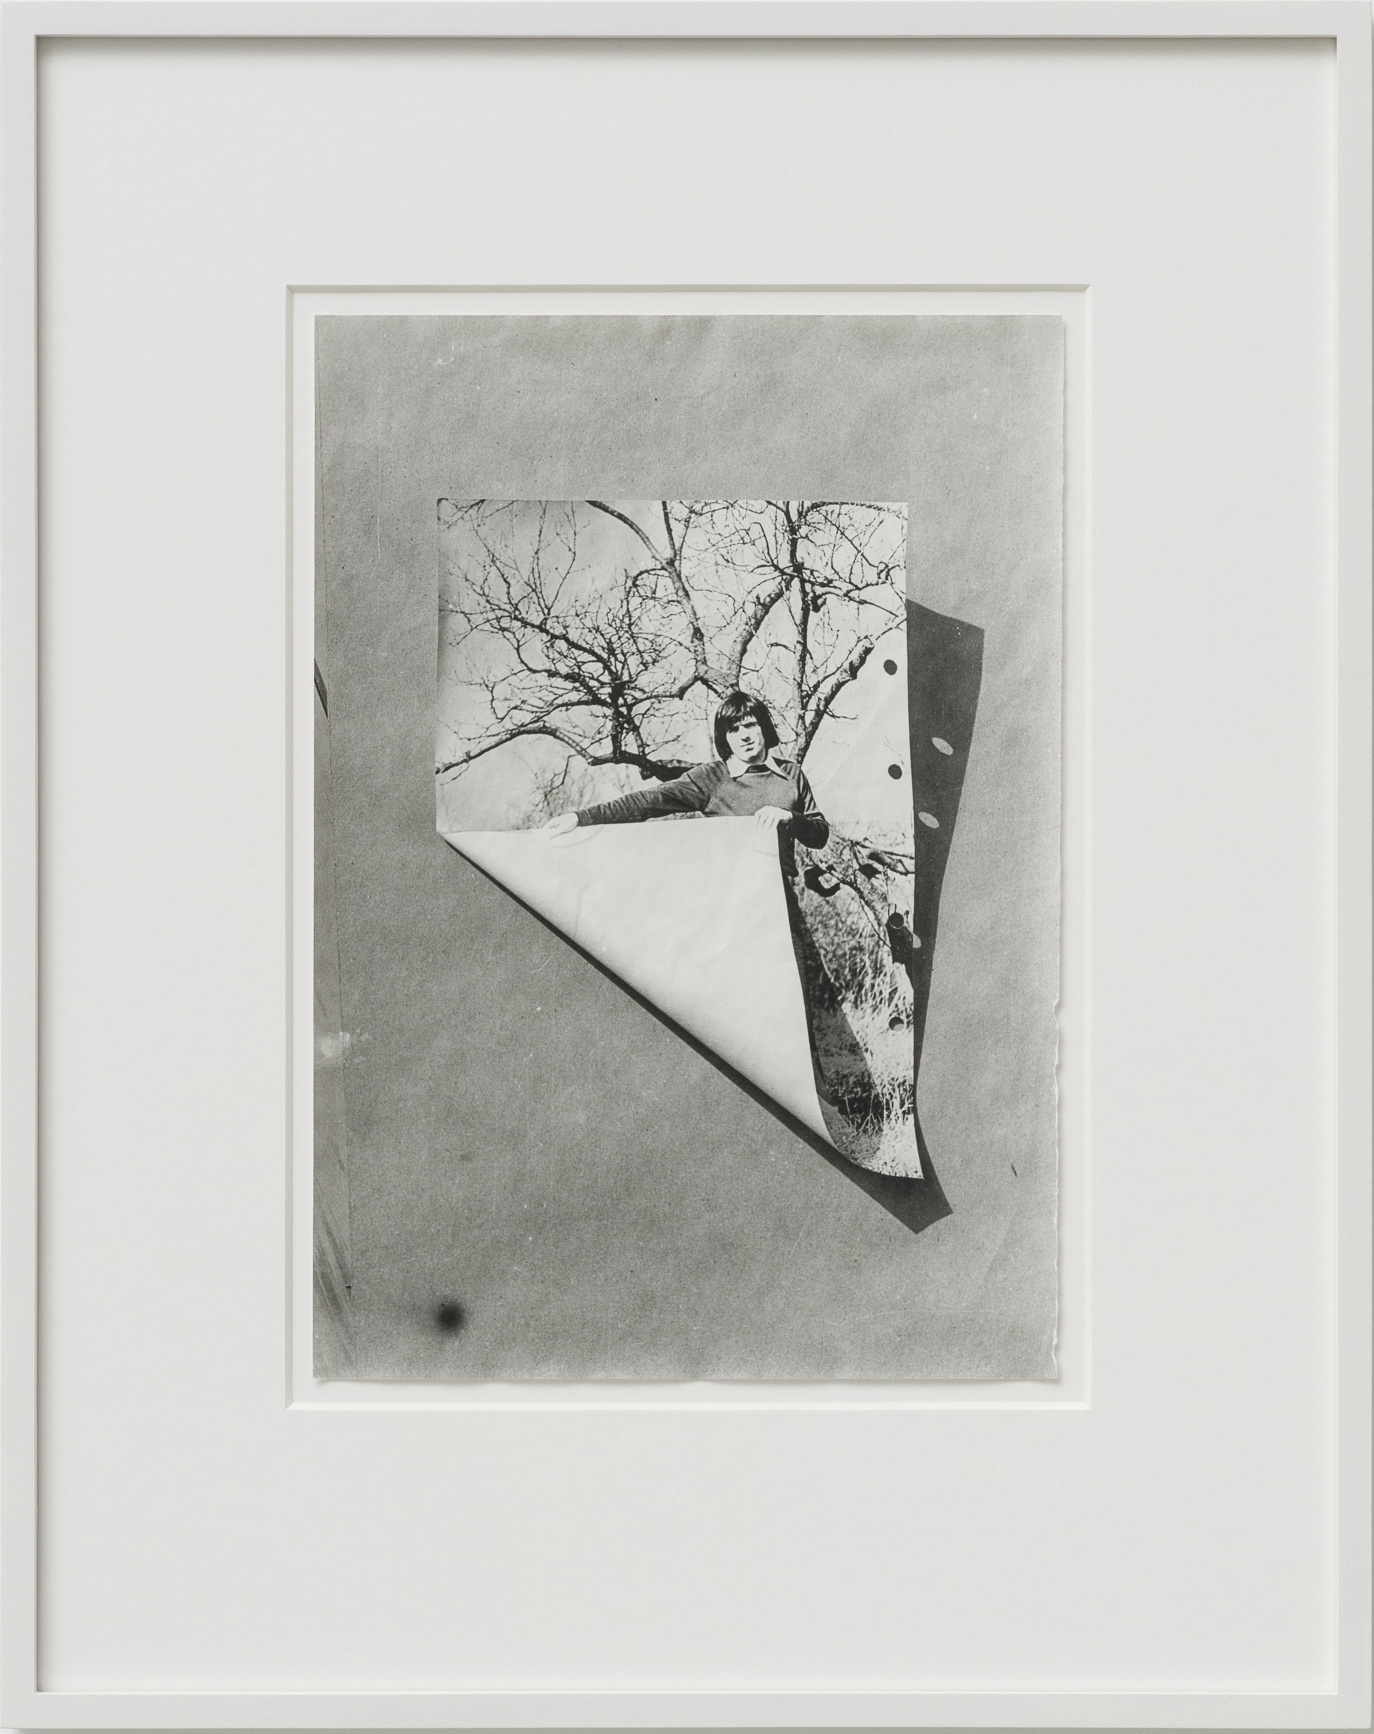 Ferenc Ficzek, Self-turning over, 1976, silver gelatin print on Dokubrom paper, 48 x 38 cm. Photo: Marcus Schneider